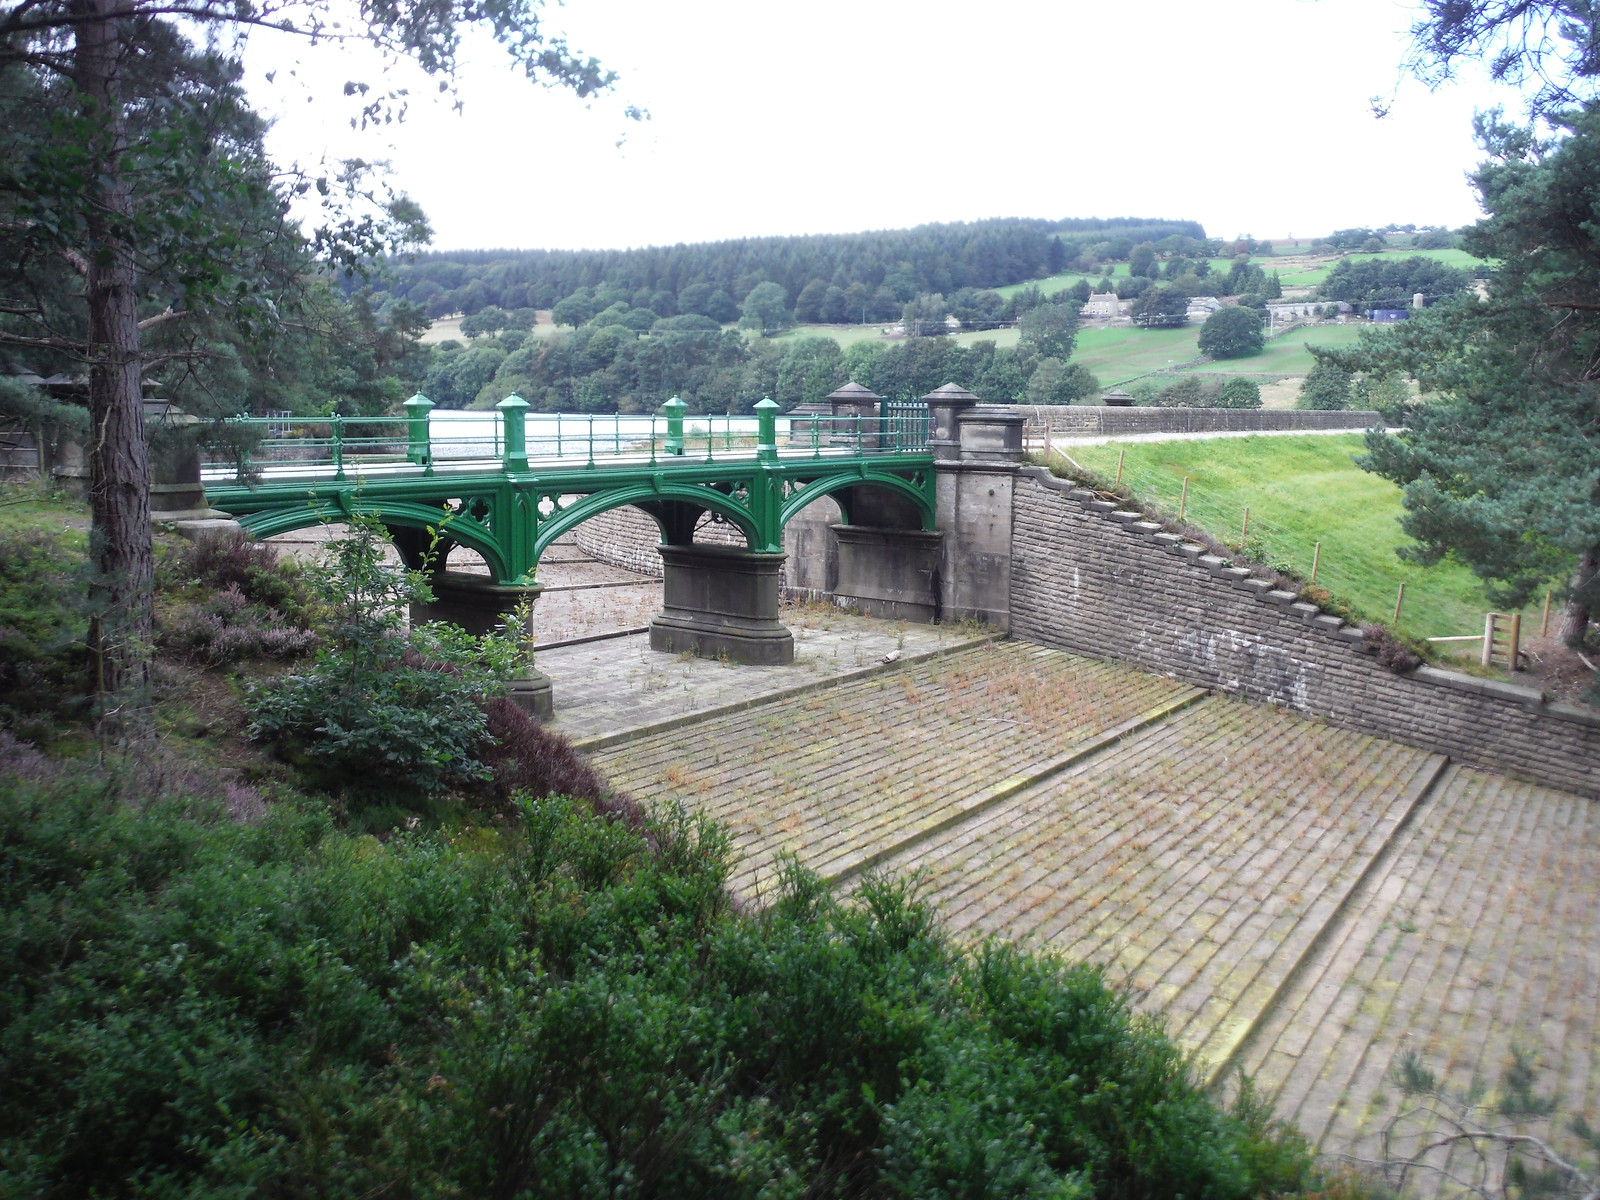 Dale Dike (Reservoir) Spillway SWC Walk 348 - Ladybower Inn Circular (via Derwent Edges and Strines)